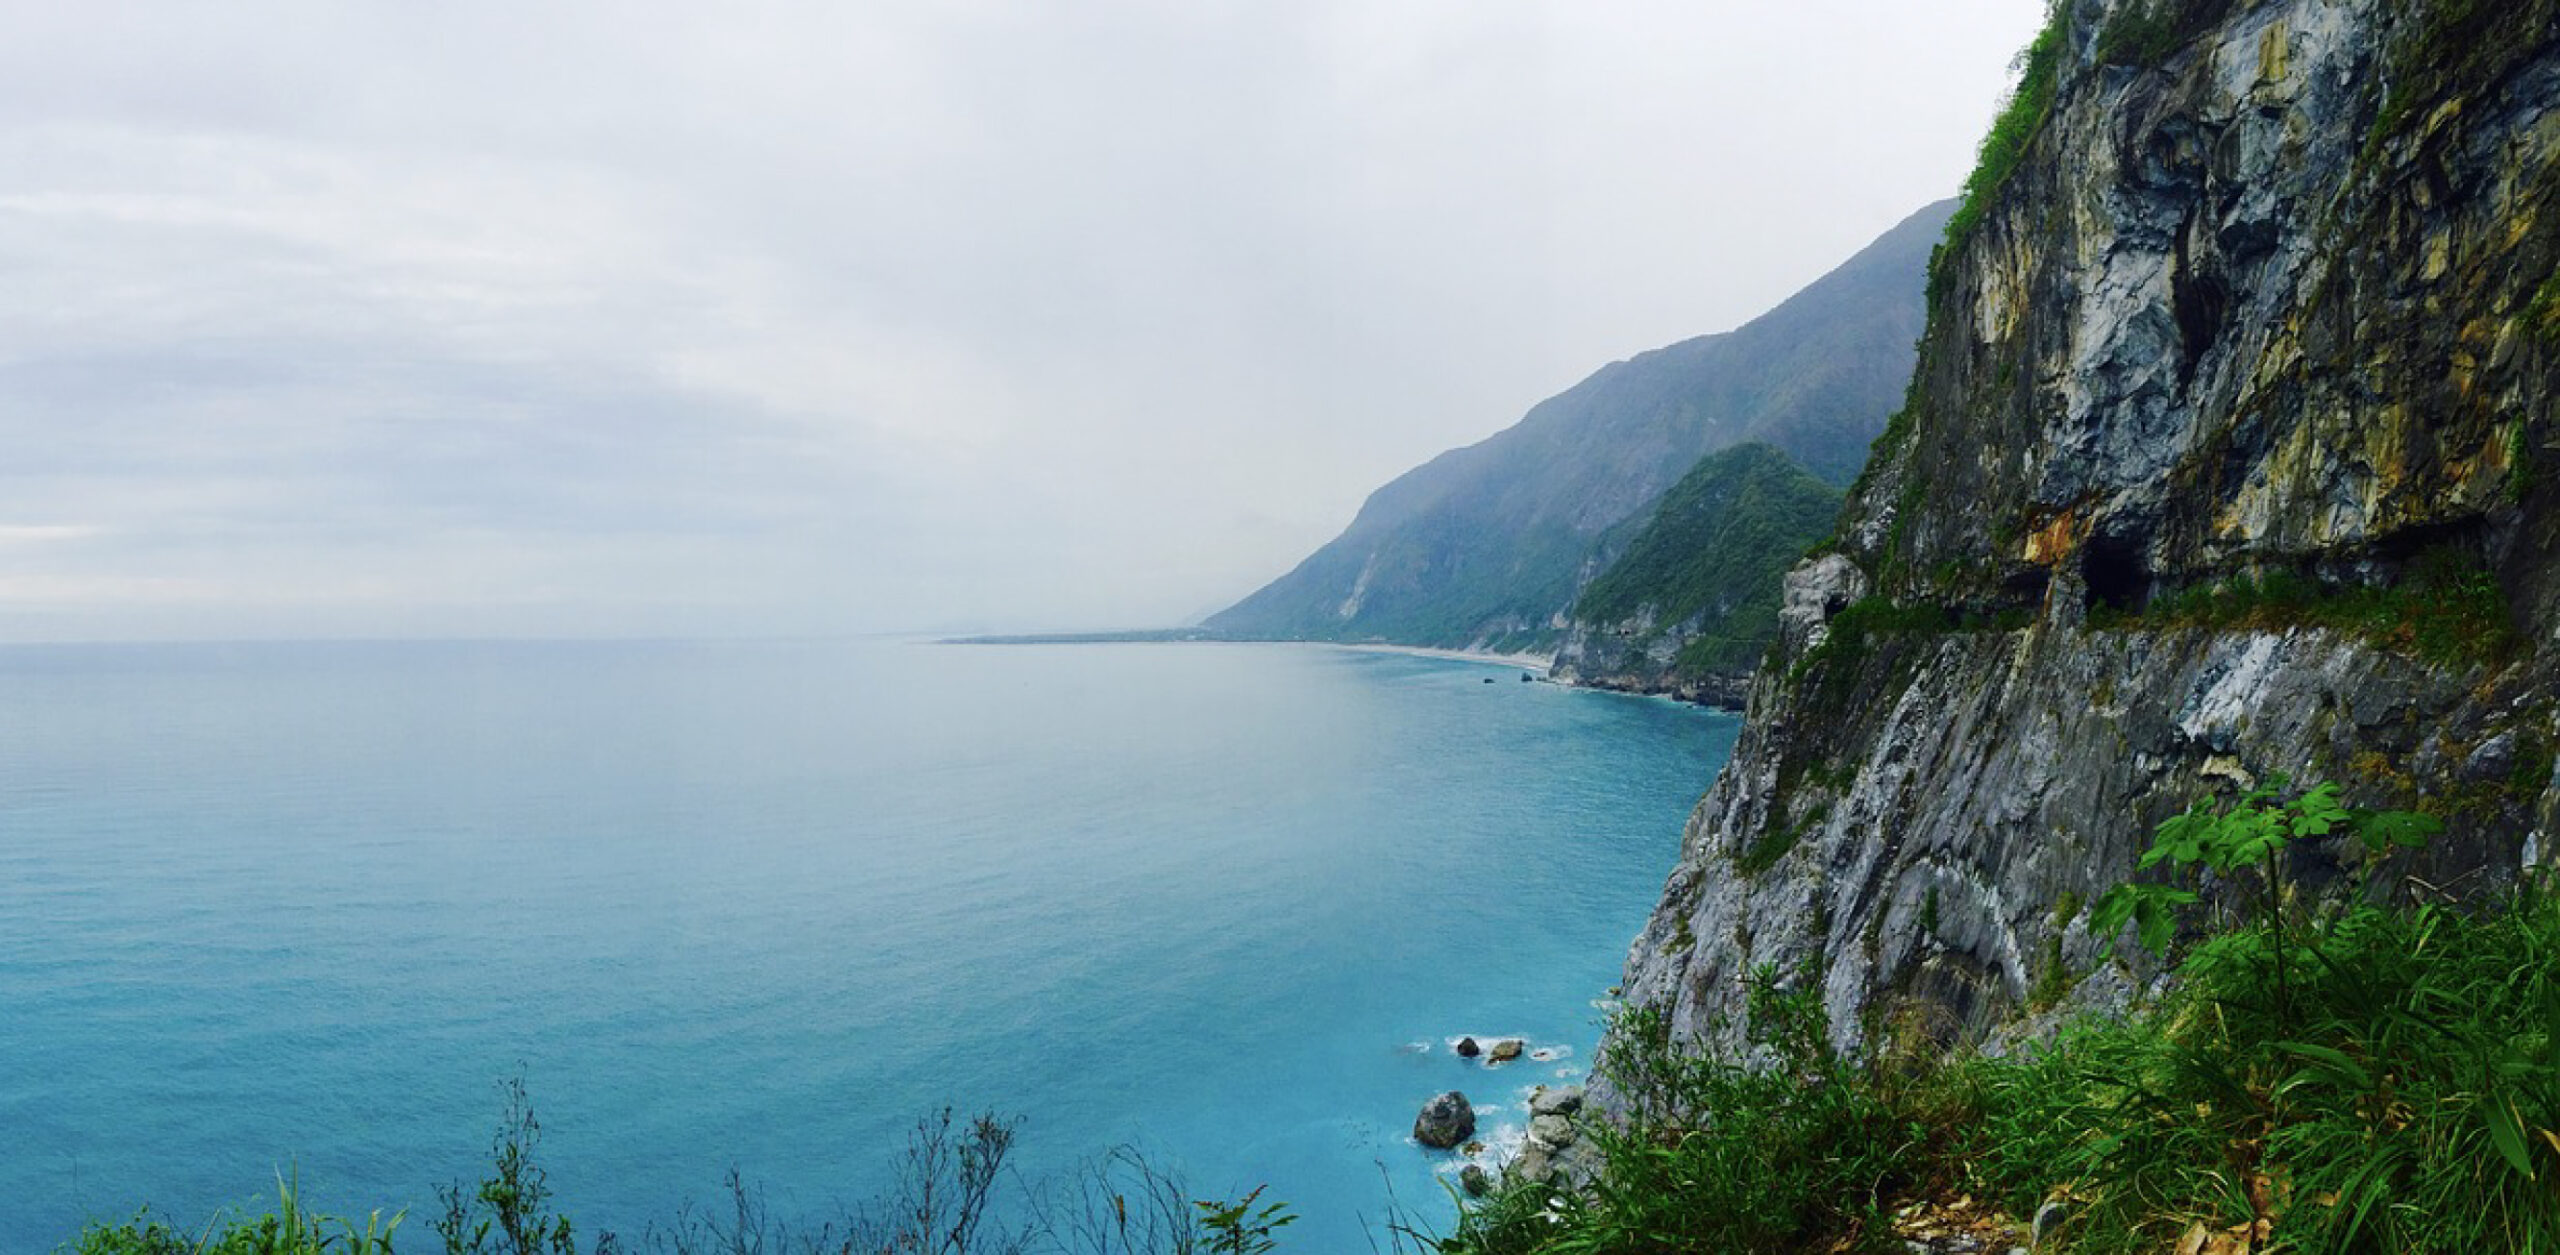 Taiwan ocean coastline